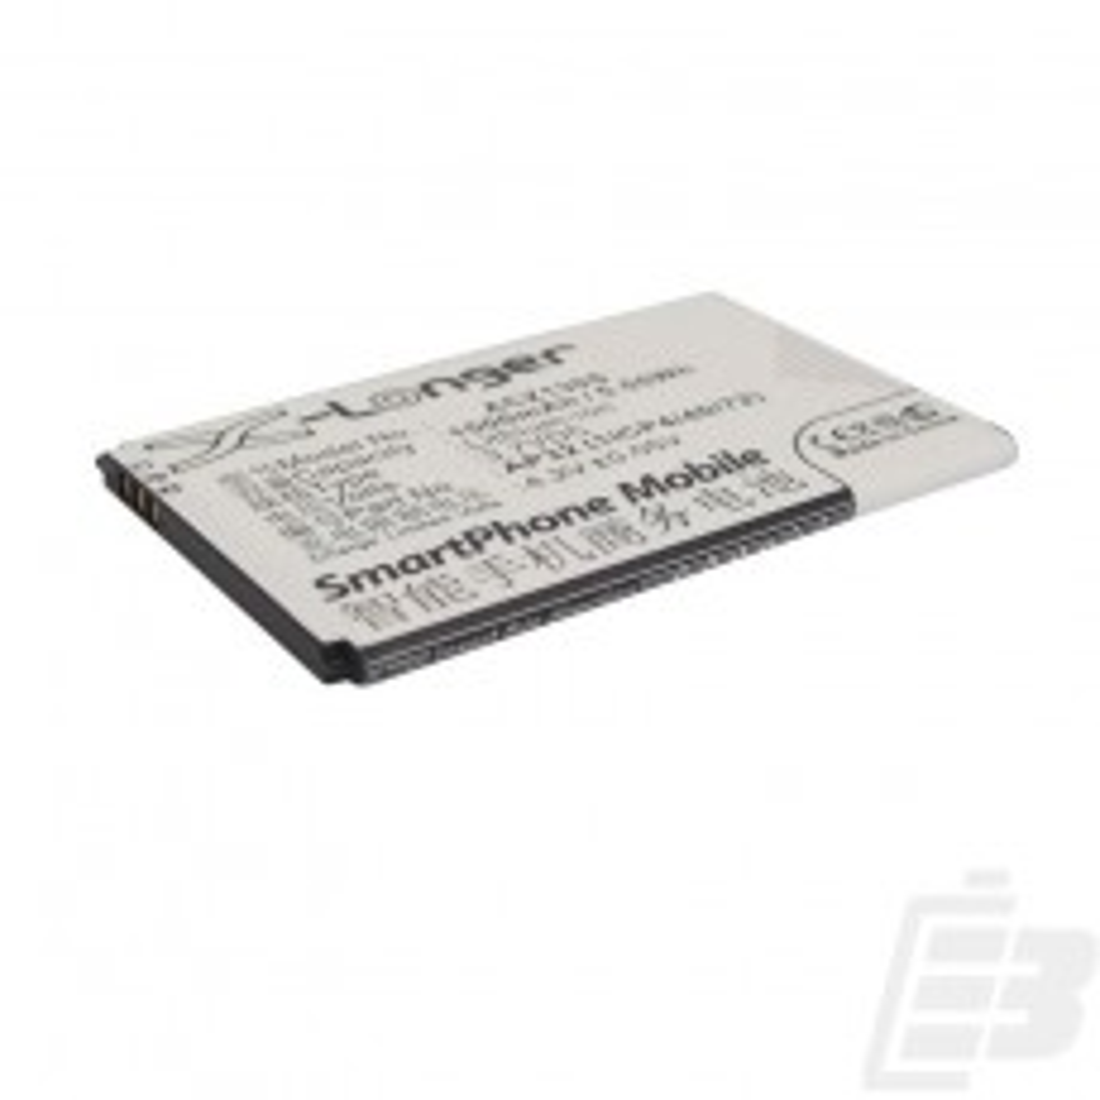 Smartphone battery Acer Liquid Z3_1